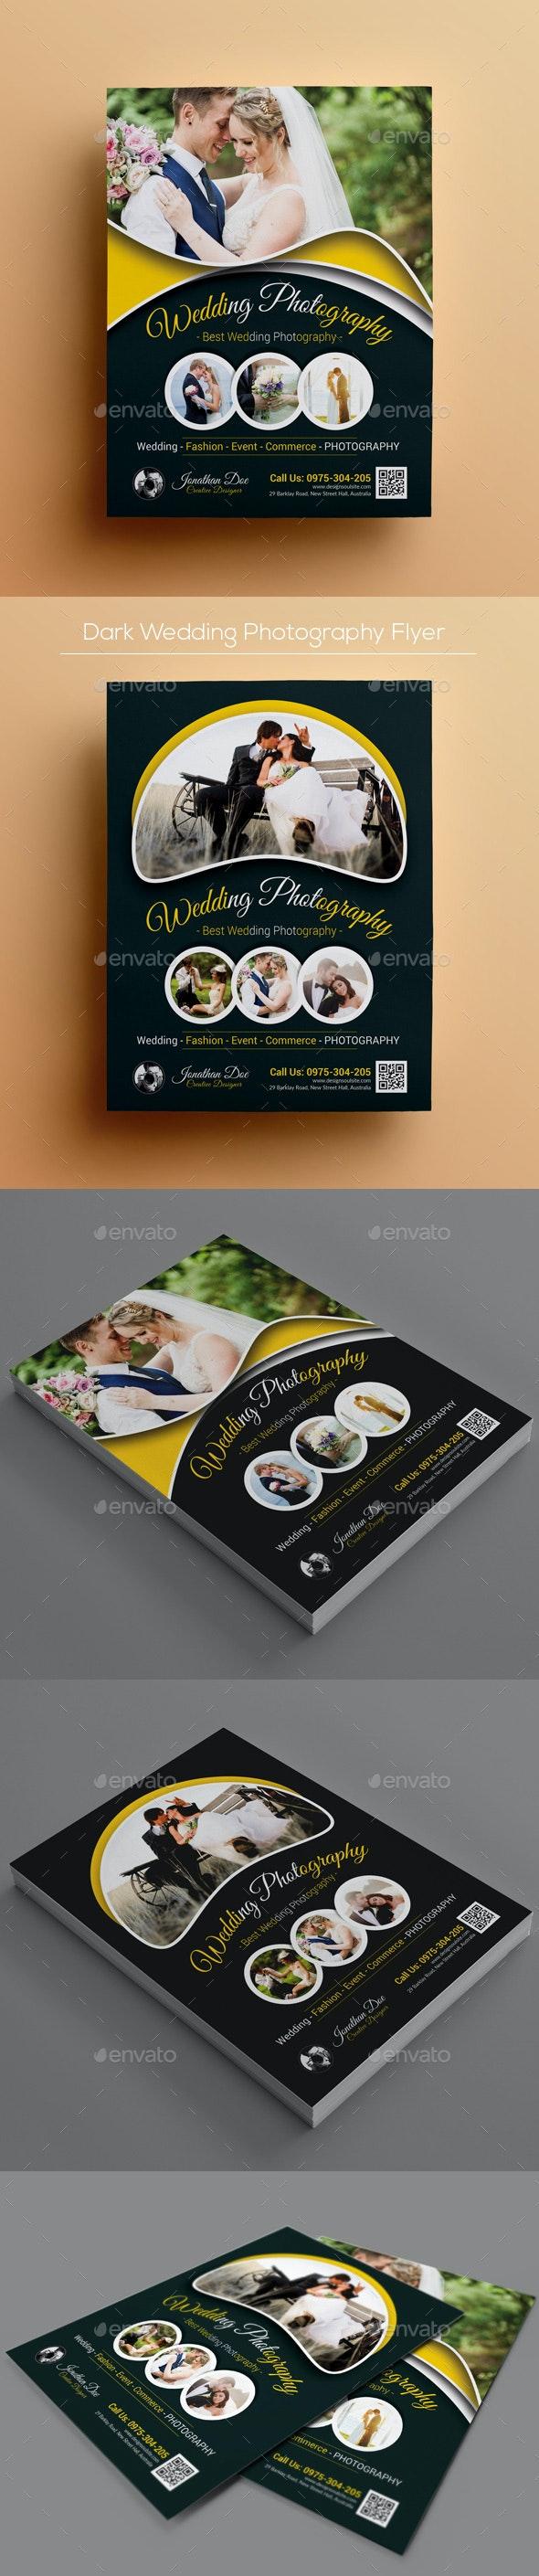 Dark Wedding Photography Flyer - Corporate Flyers